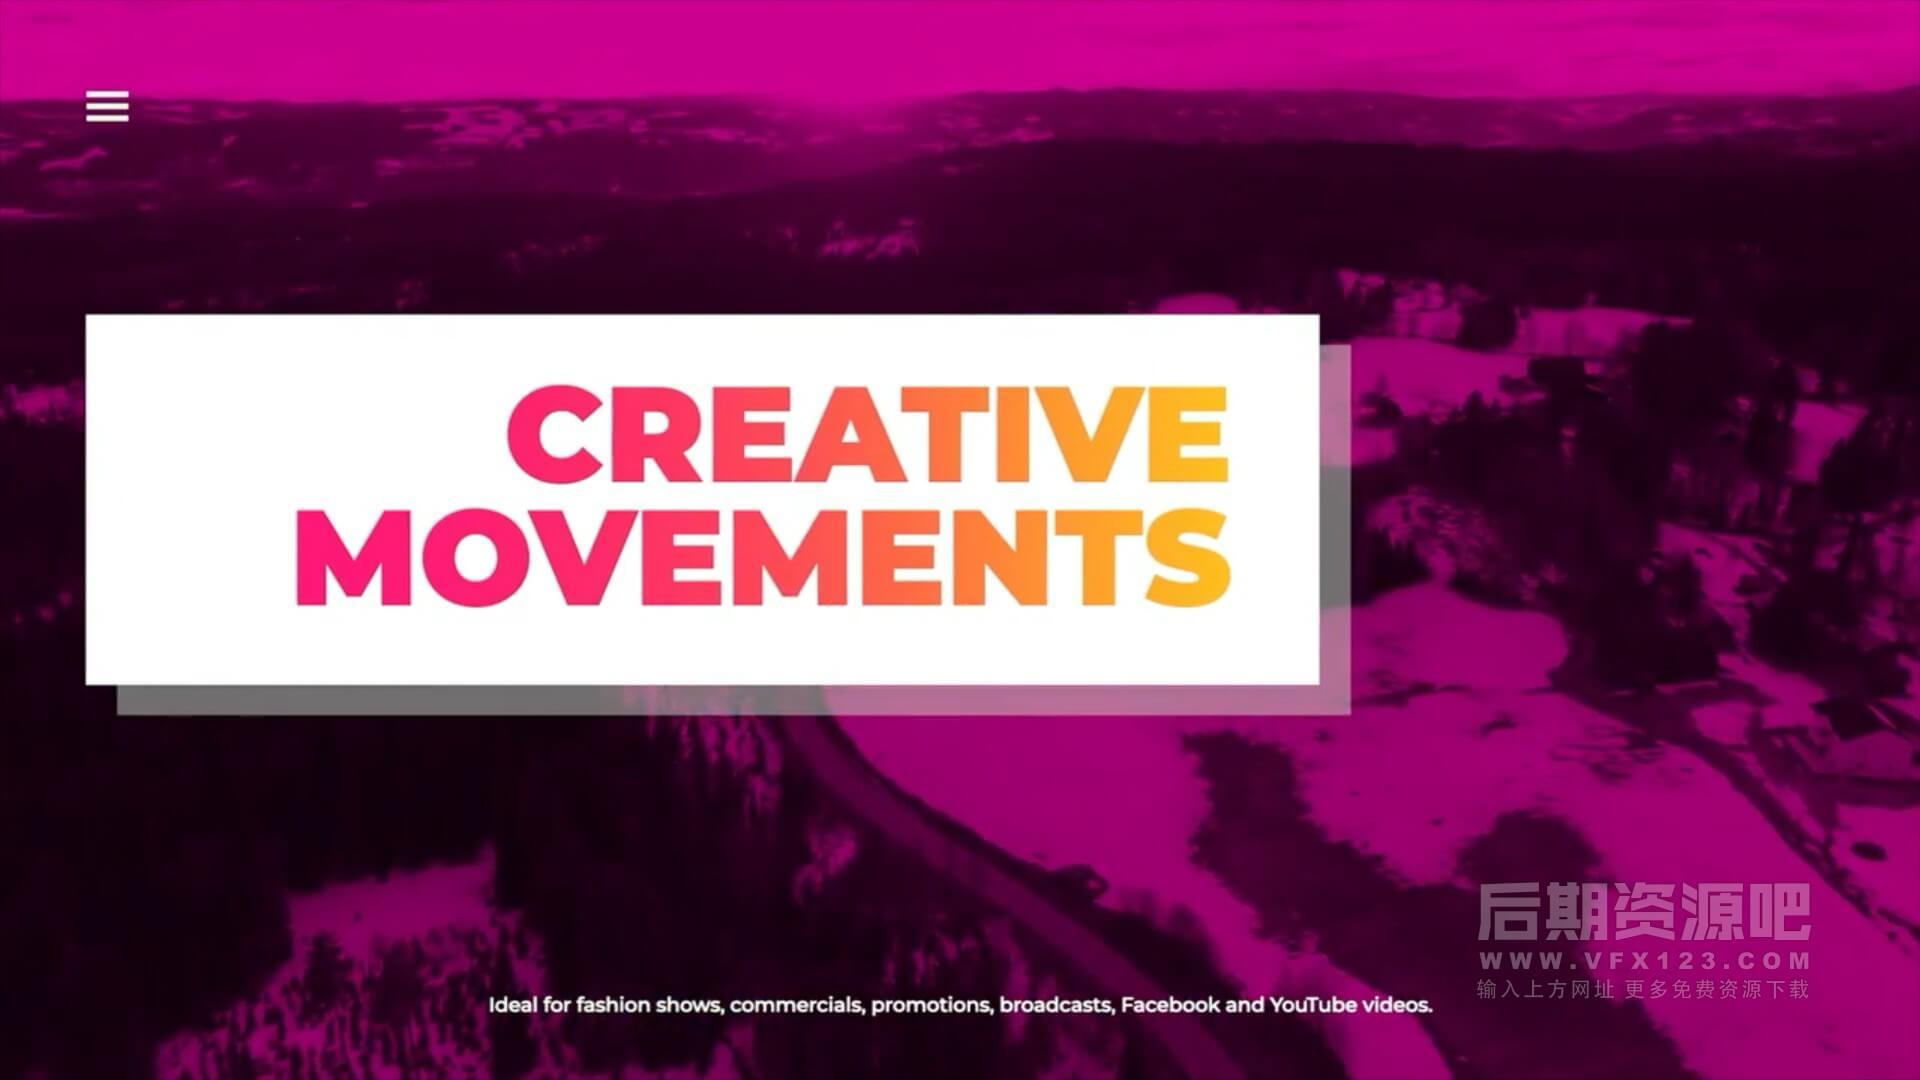 fcpx插件 12组精美文字标题排版动画带转场 Elegant Typo Scenes